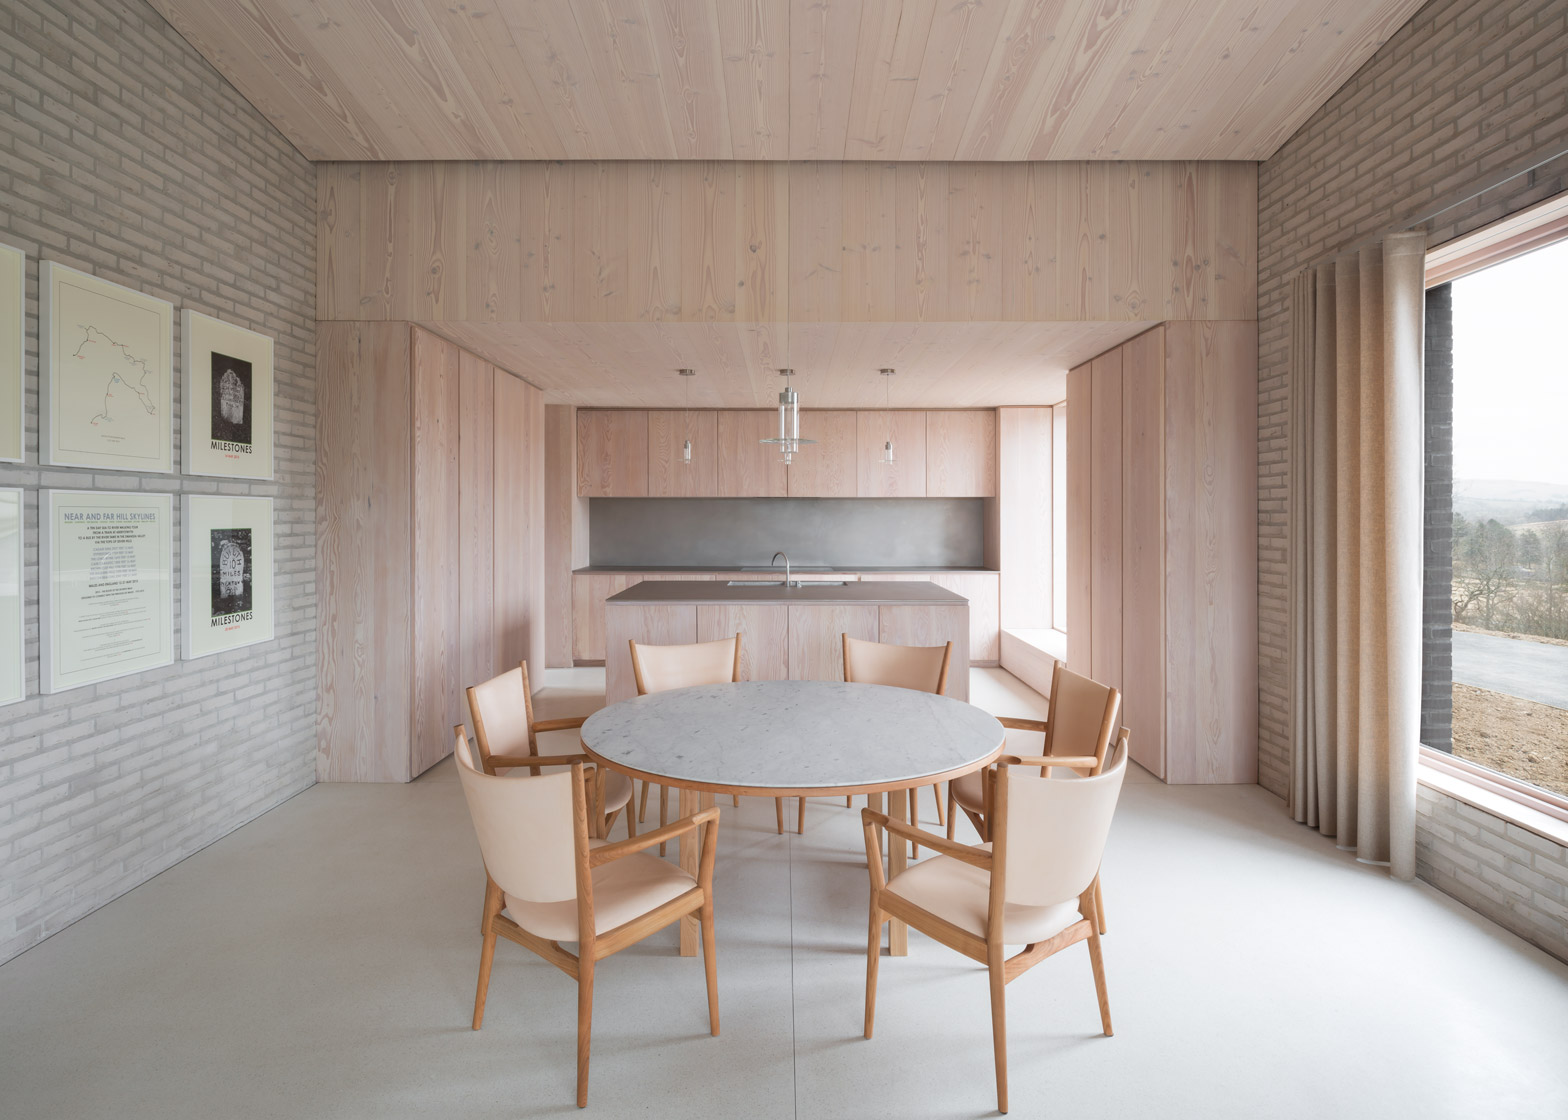 John Pawsons Life House is built from dark and light bricks